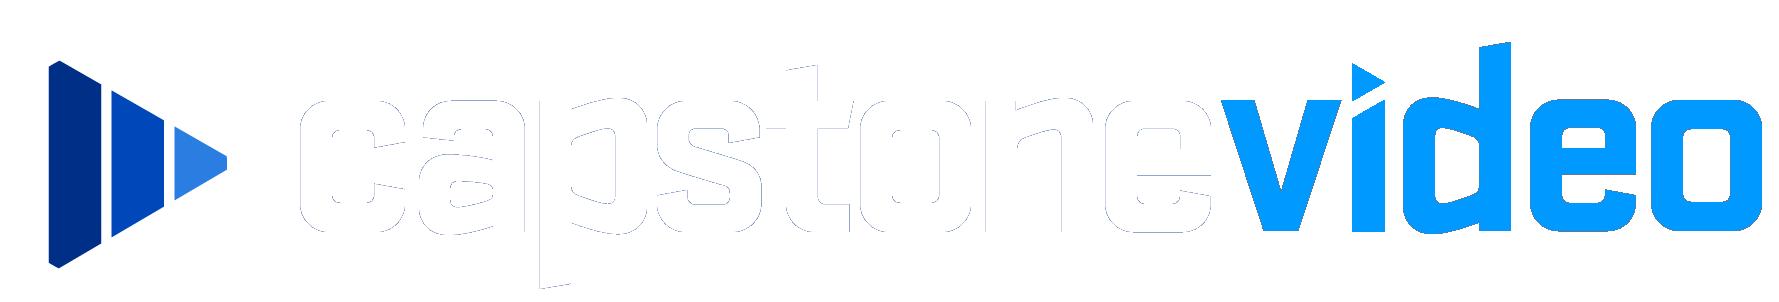 Capstone Video Marketing Logo